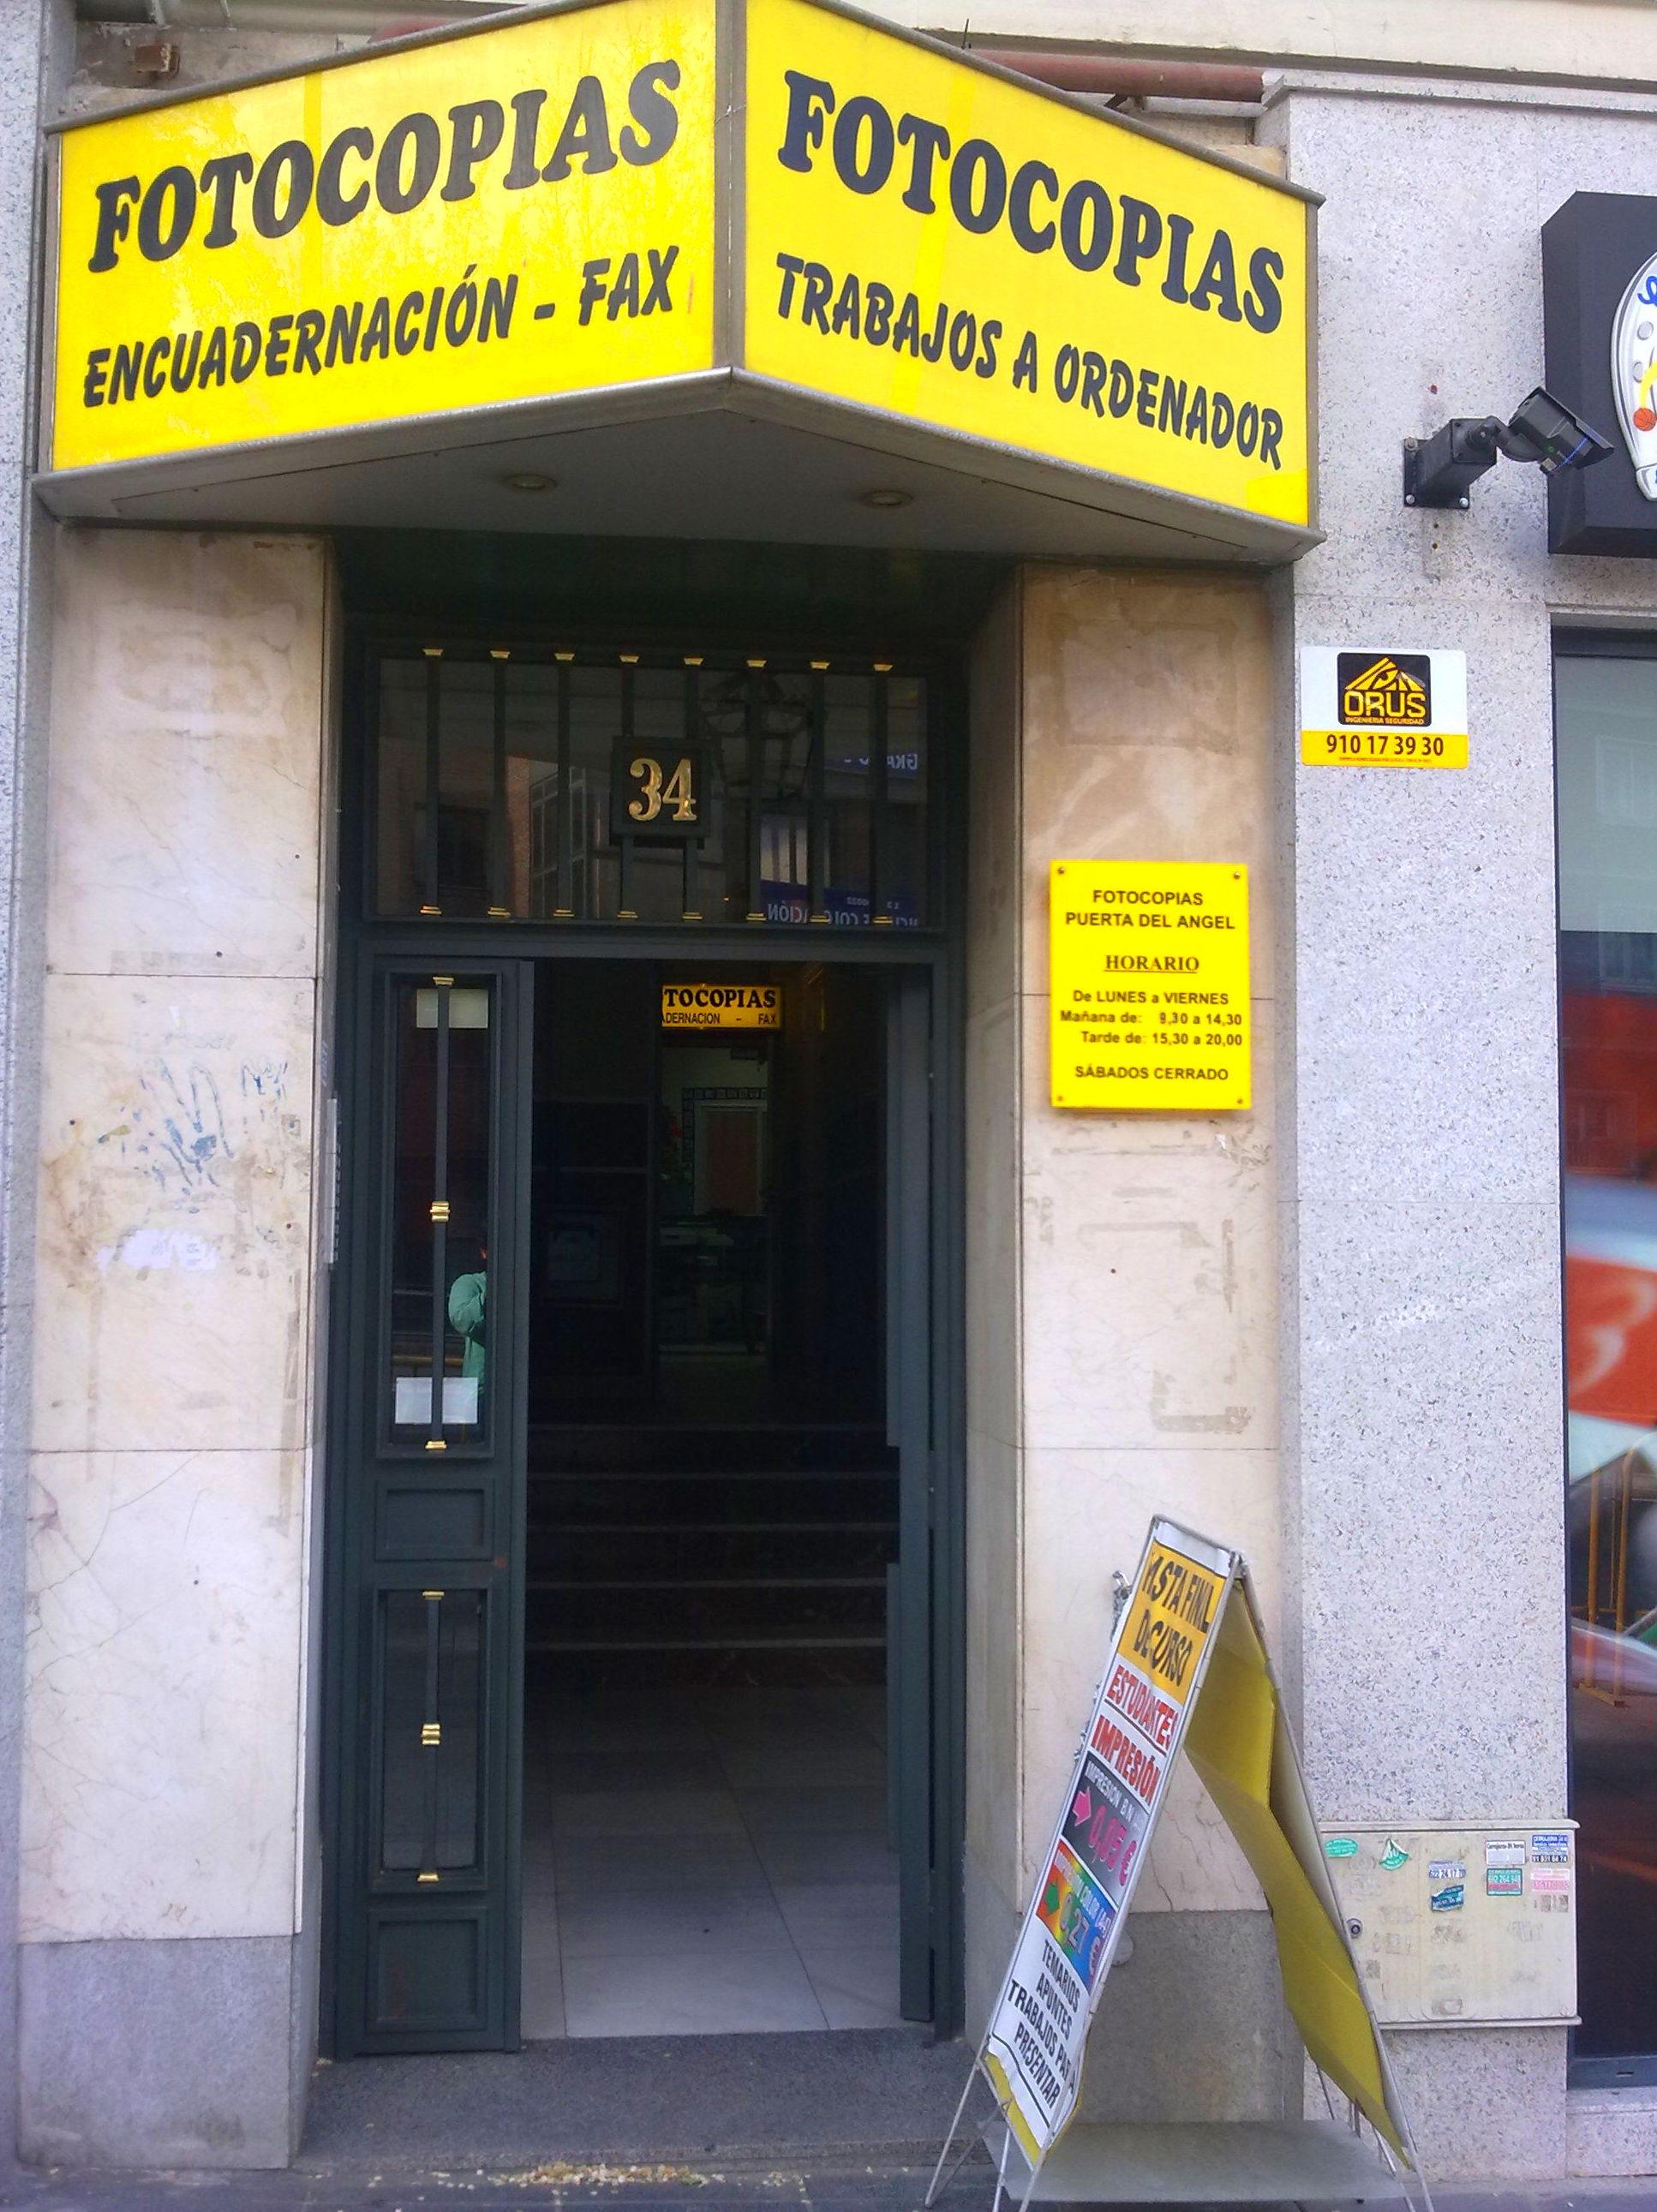 PUERTA TRASERA - ENTRADA PORTAL